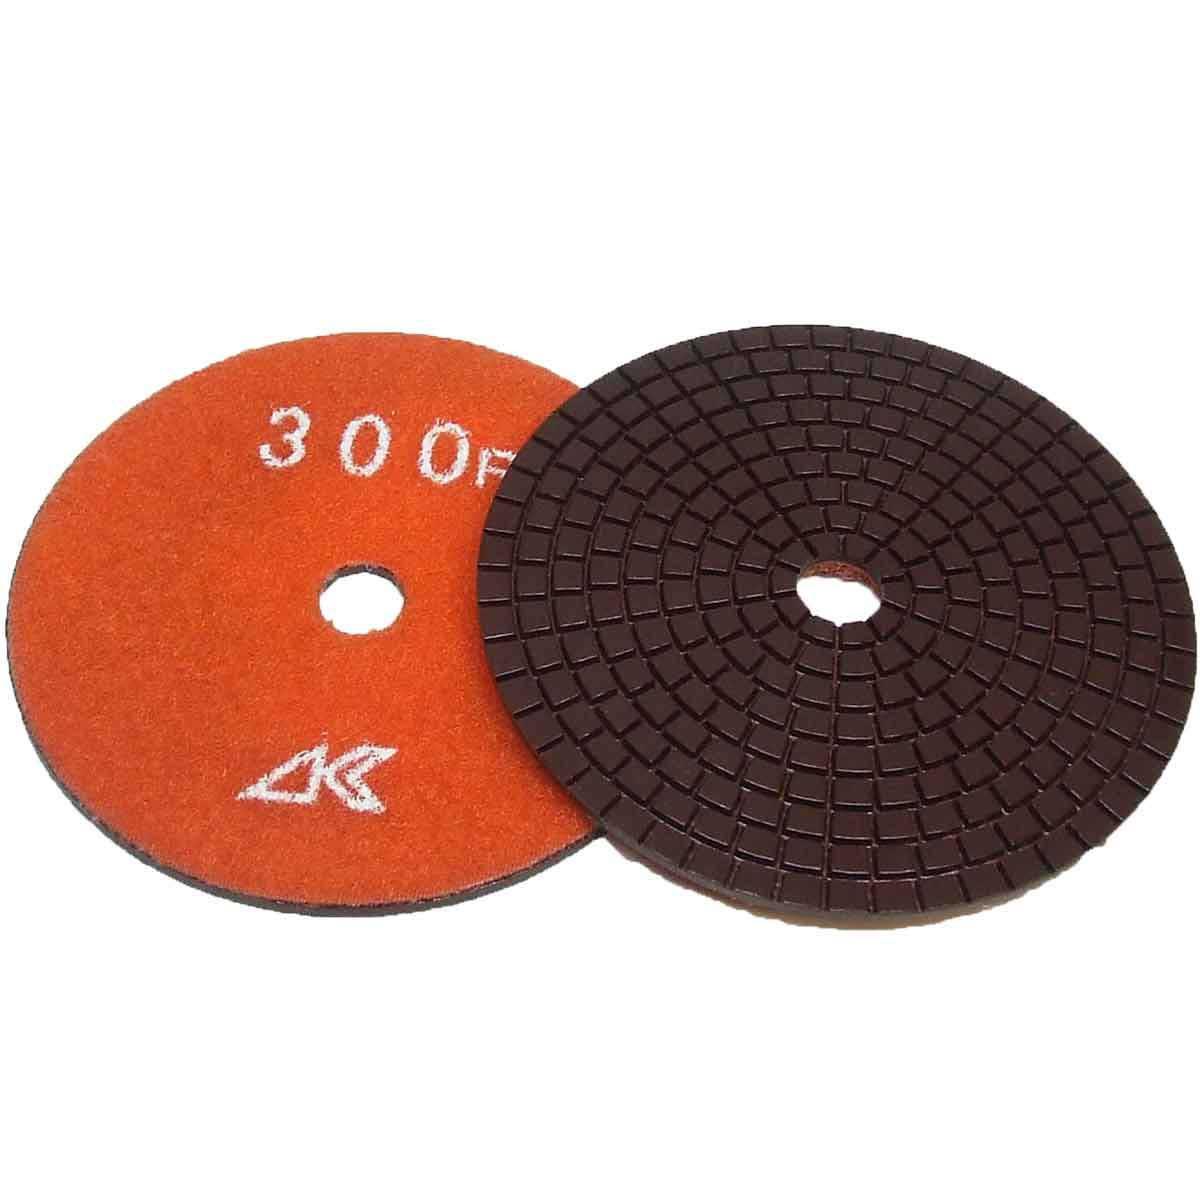 GP40300V 300 Grit Wet Stone Pads